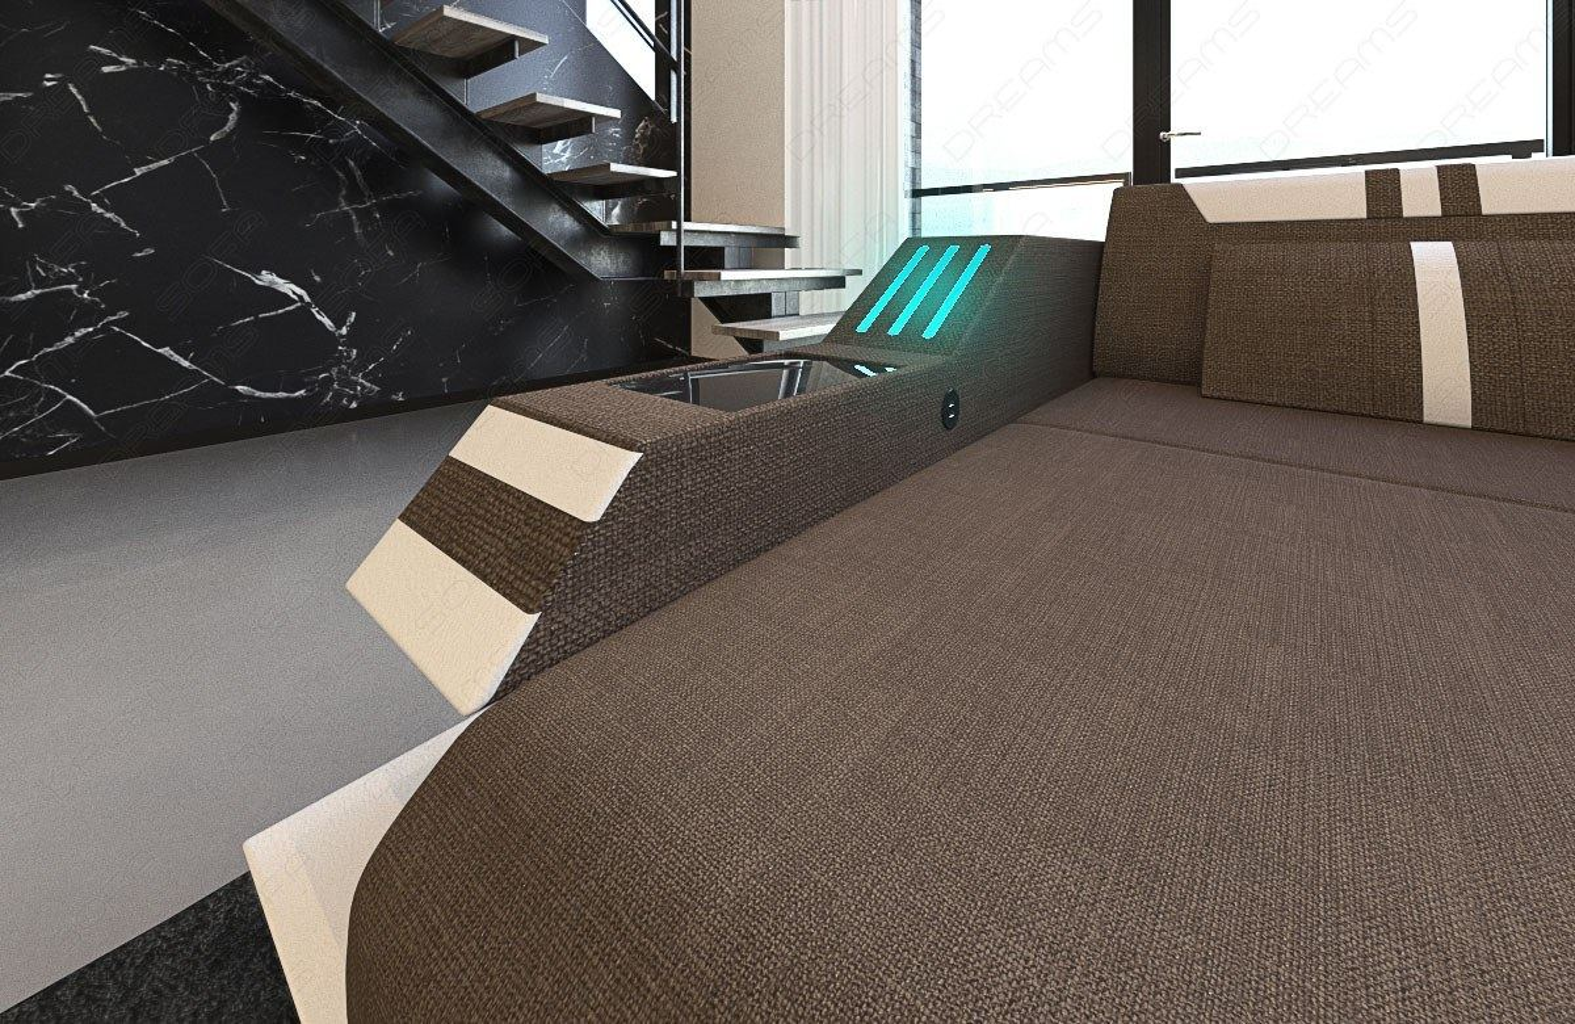 polstersofa ravenna l braun ecksofa mit led beleuchtung. Black Bedroom Furniture Sets. Home Design Ideas